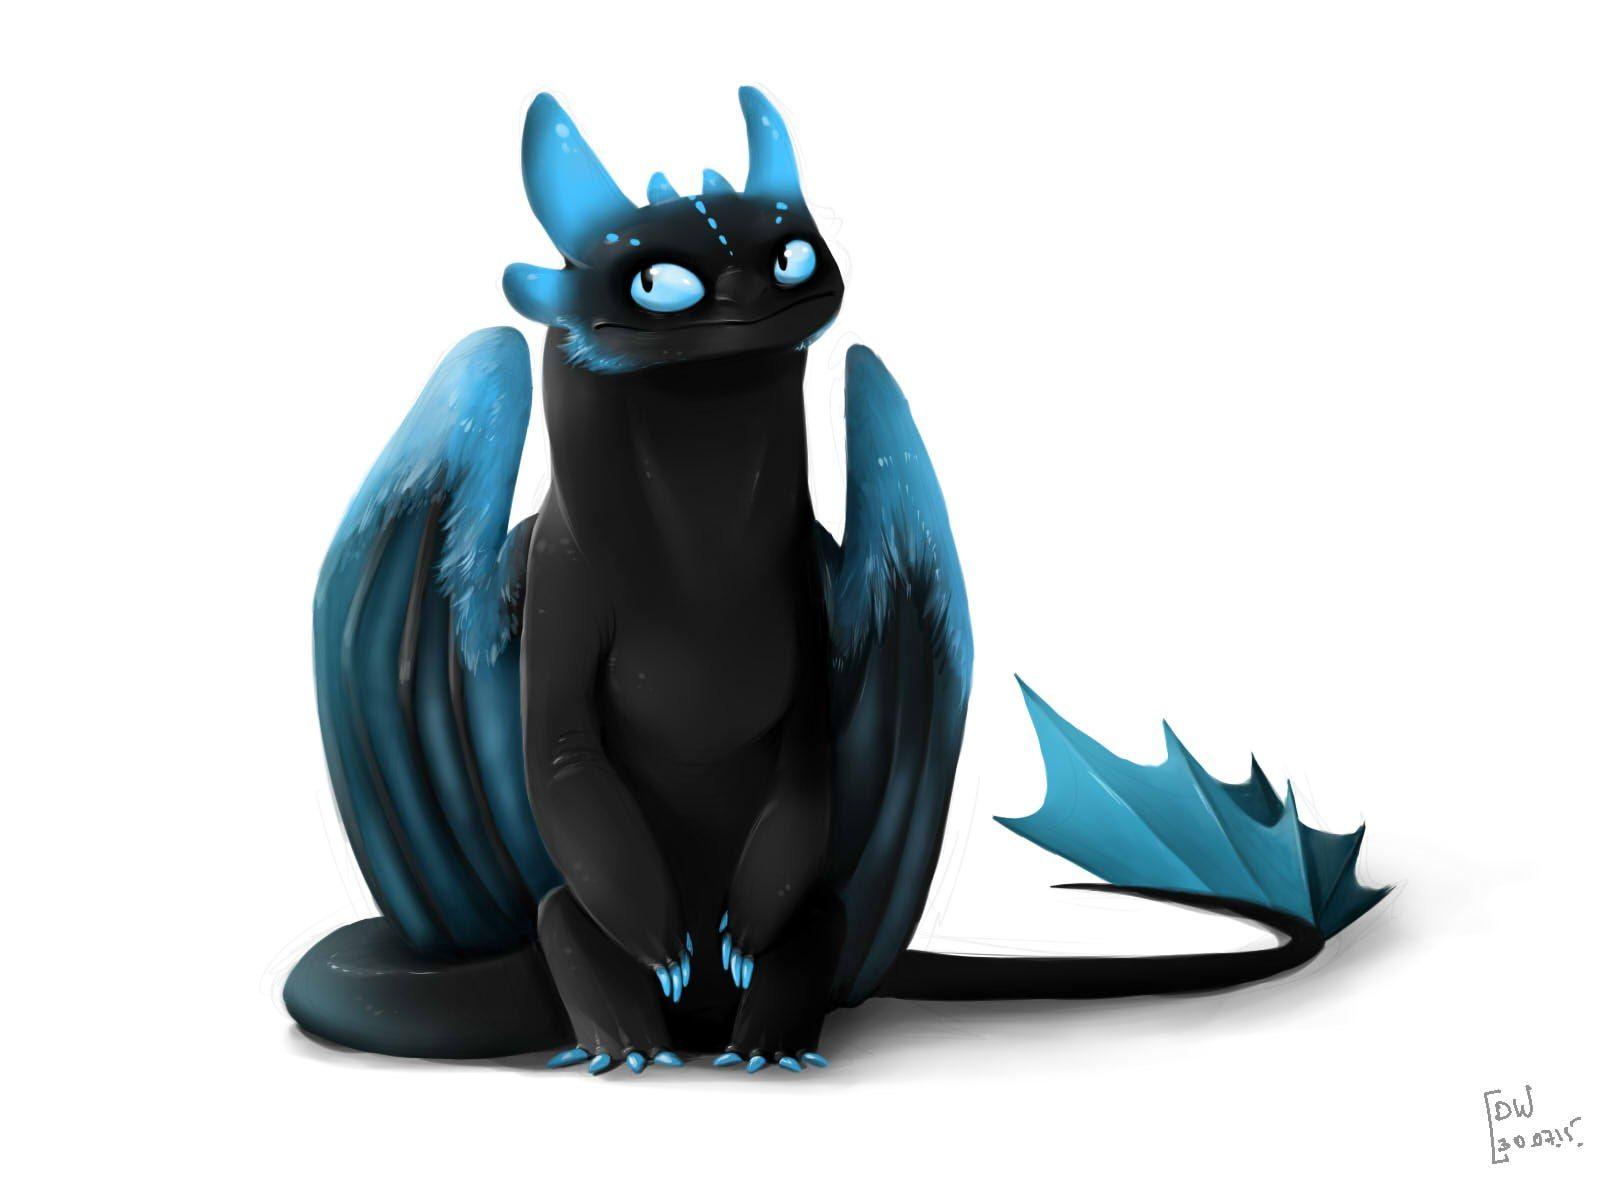 Pingl par c drine gr tter honsberger sur dragons - Furie nocturne dragon ...